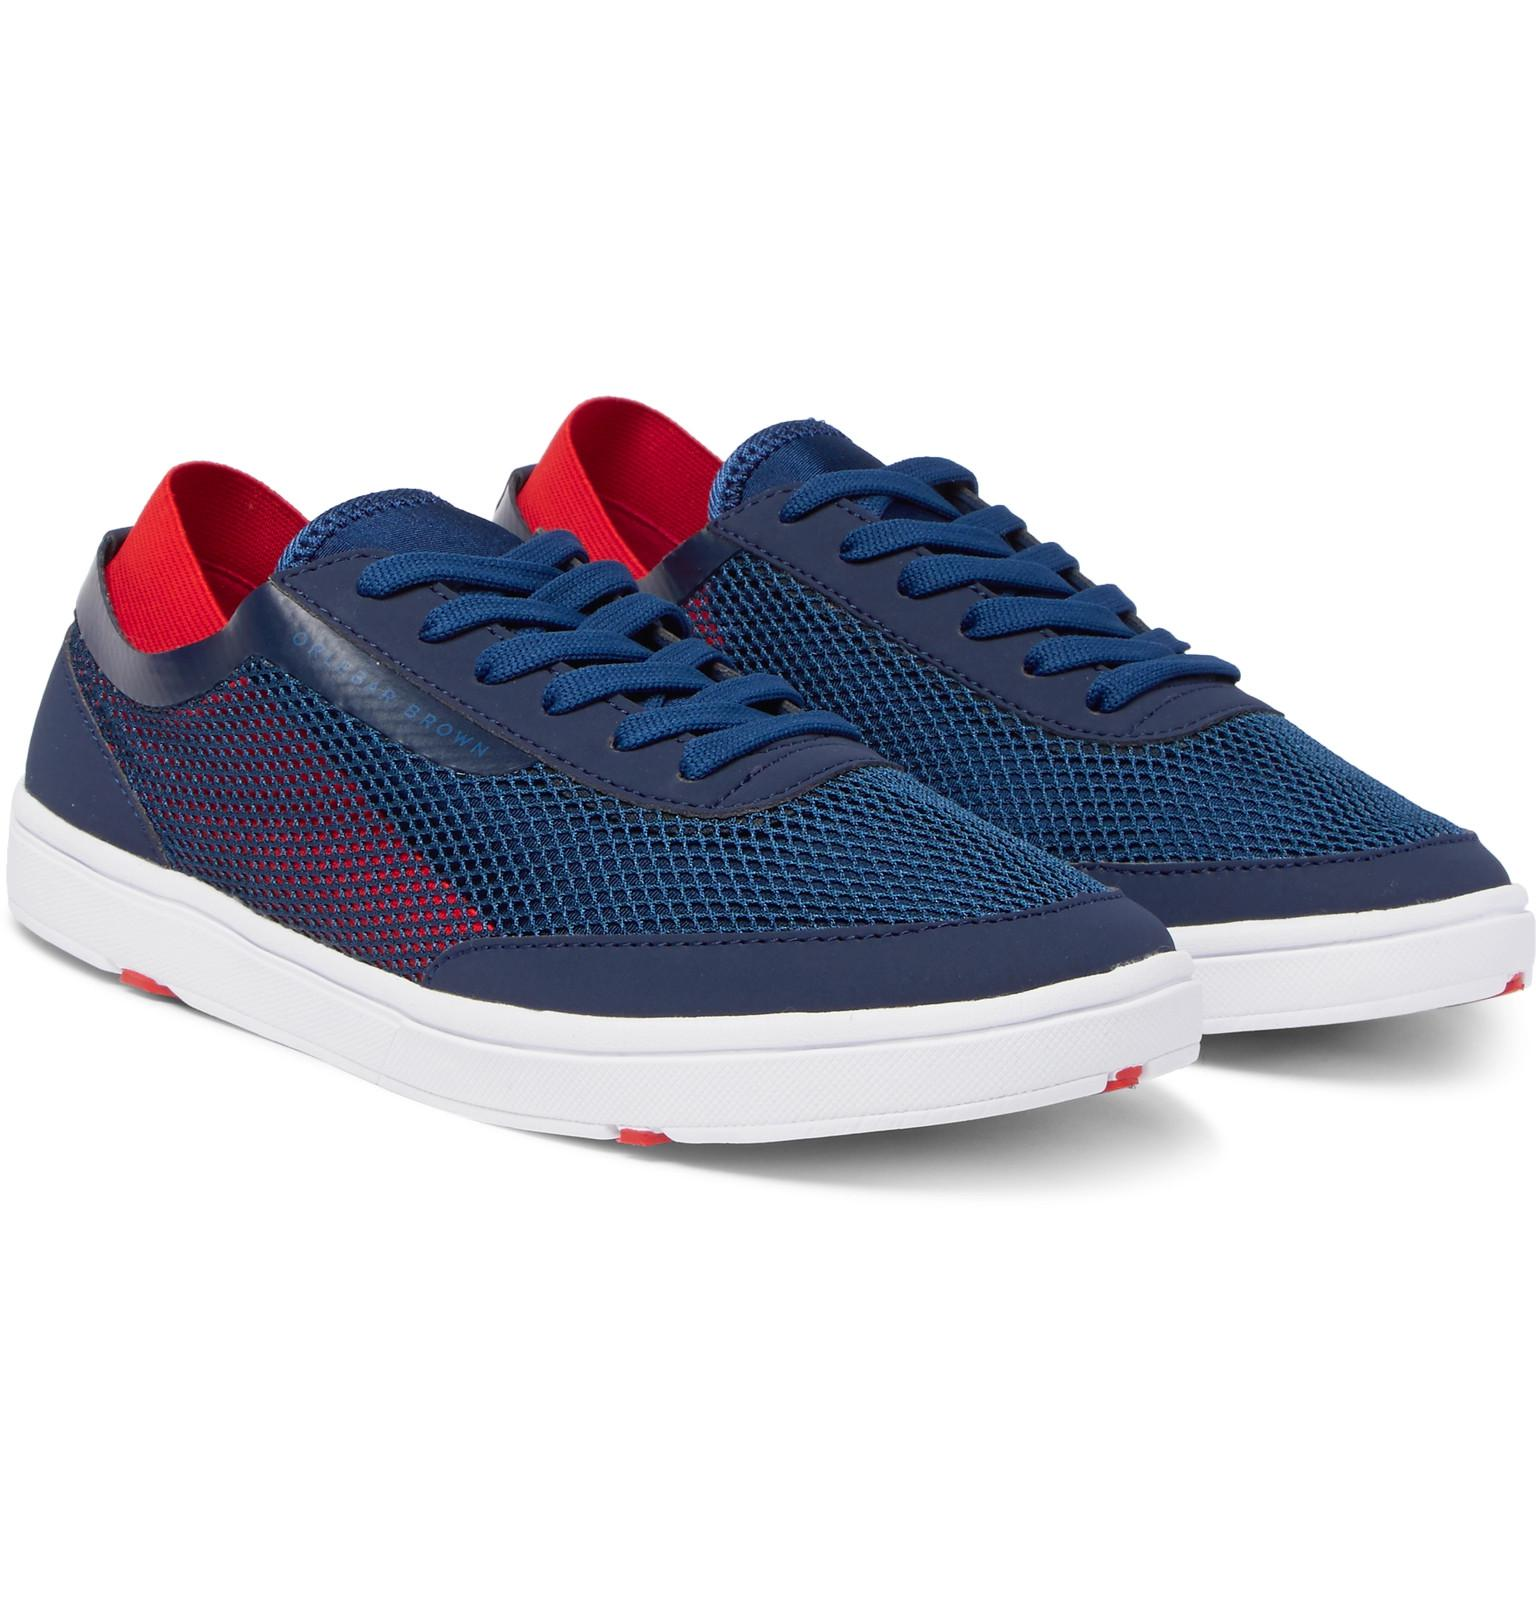 Larson Panelled Mesh Sneakers Orlebar Brown LvoQVe